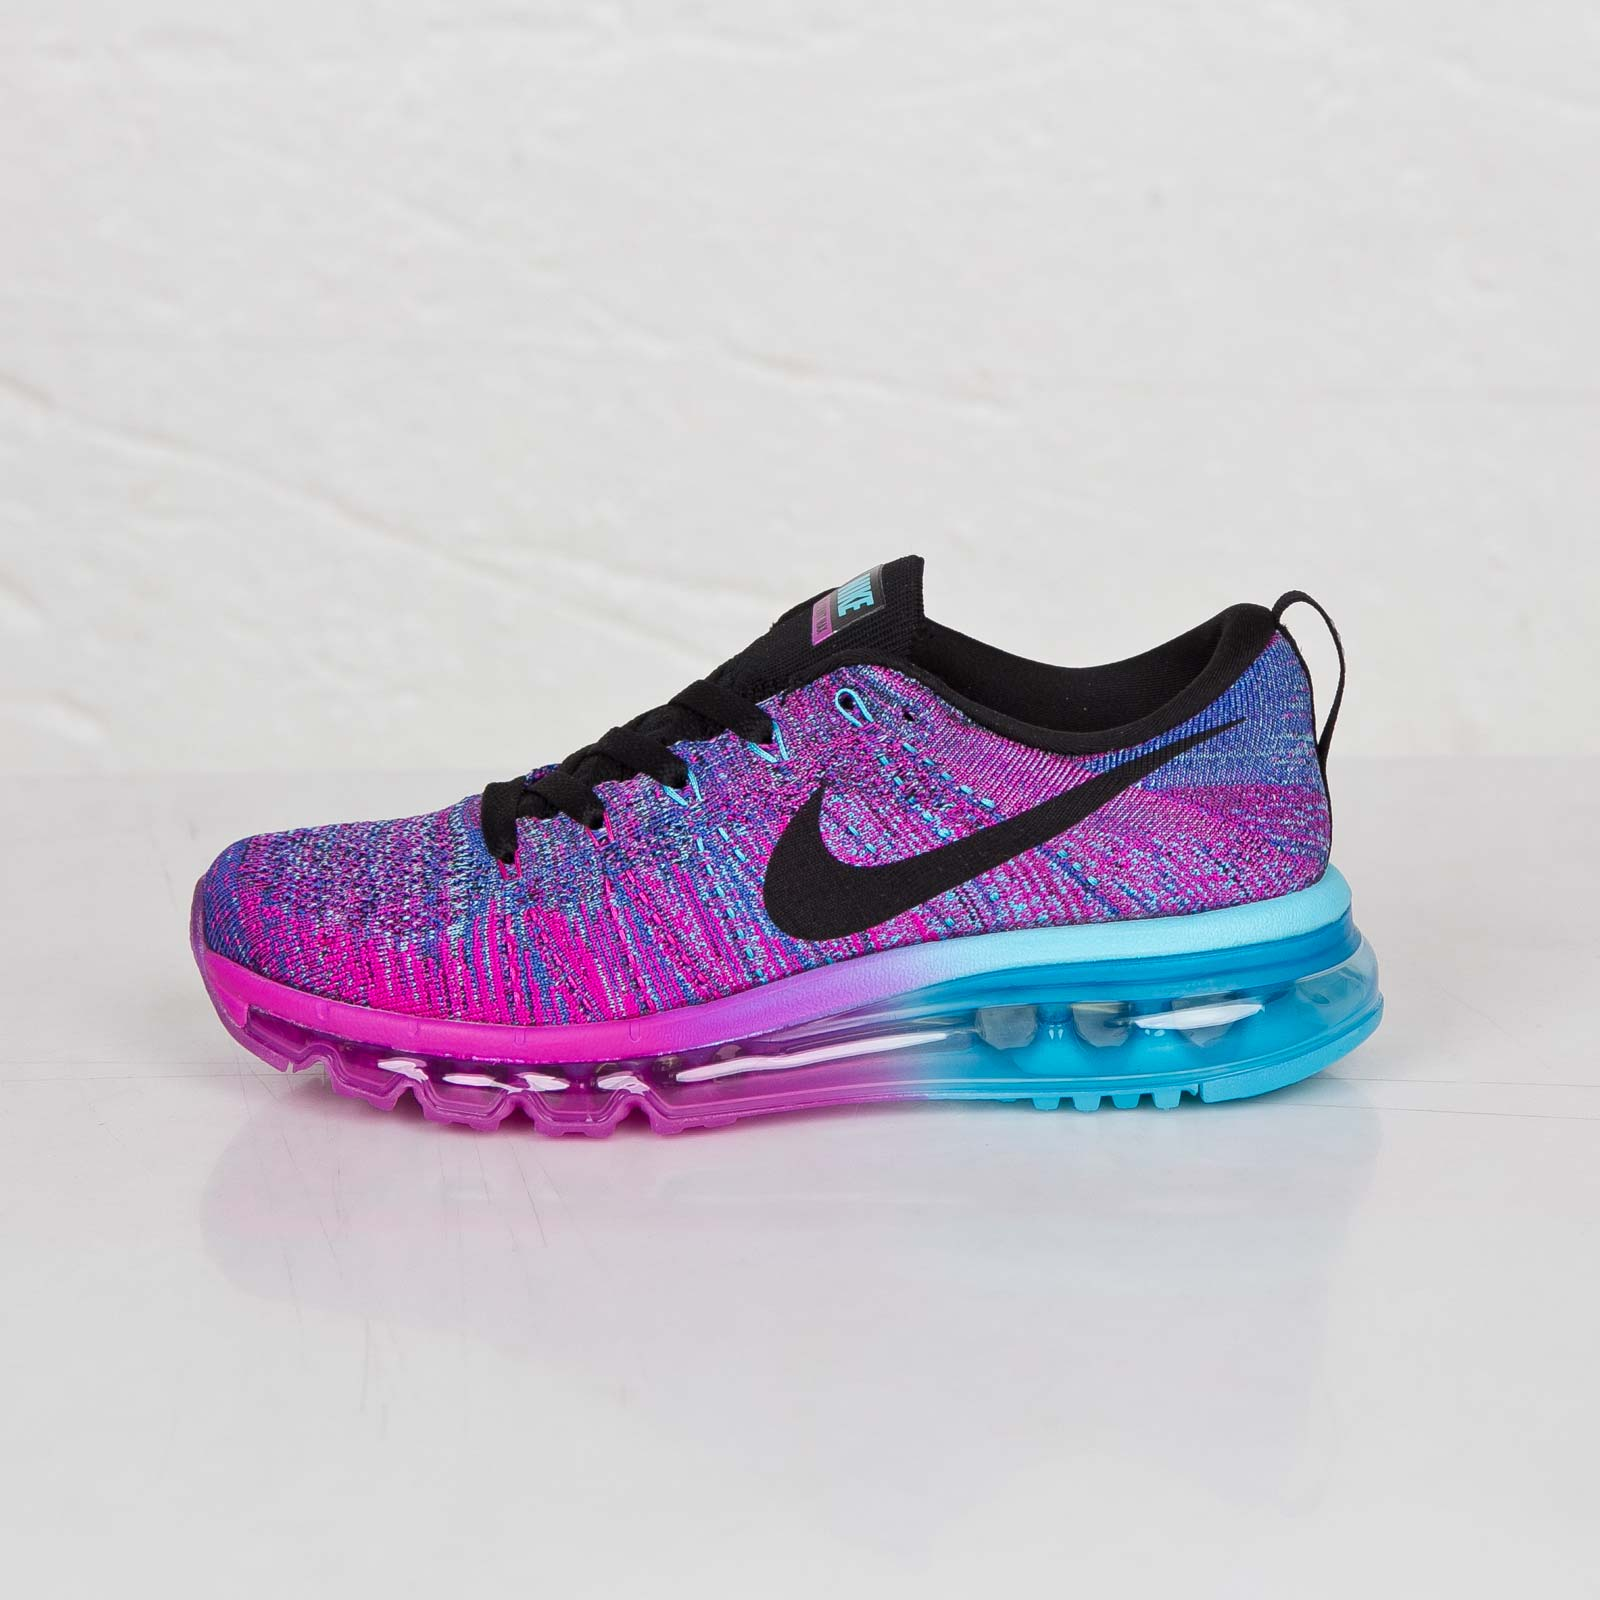 c6558d24e2289c Nike Wmns Flyknit Max - 620659-502 - Sneakersnstuff